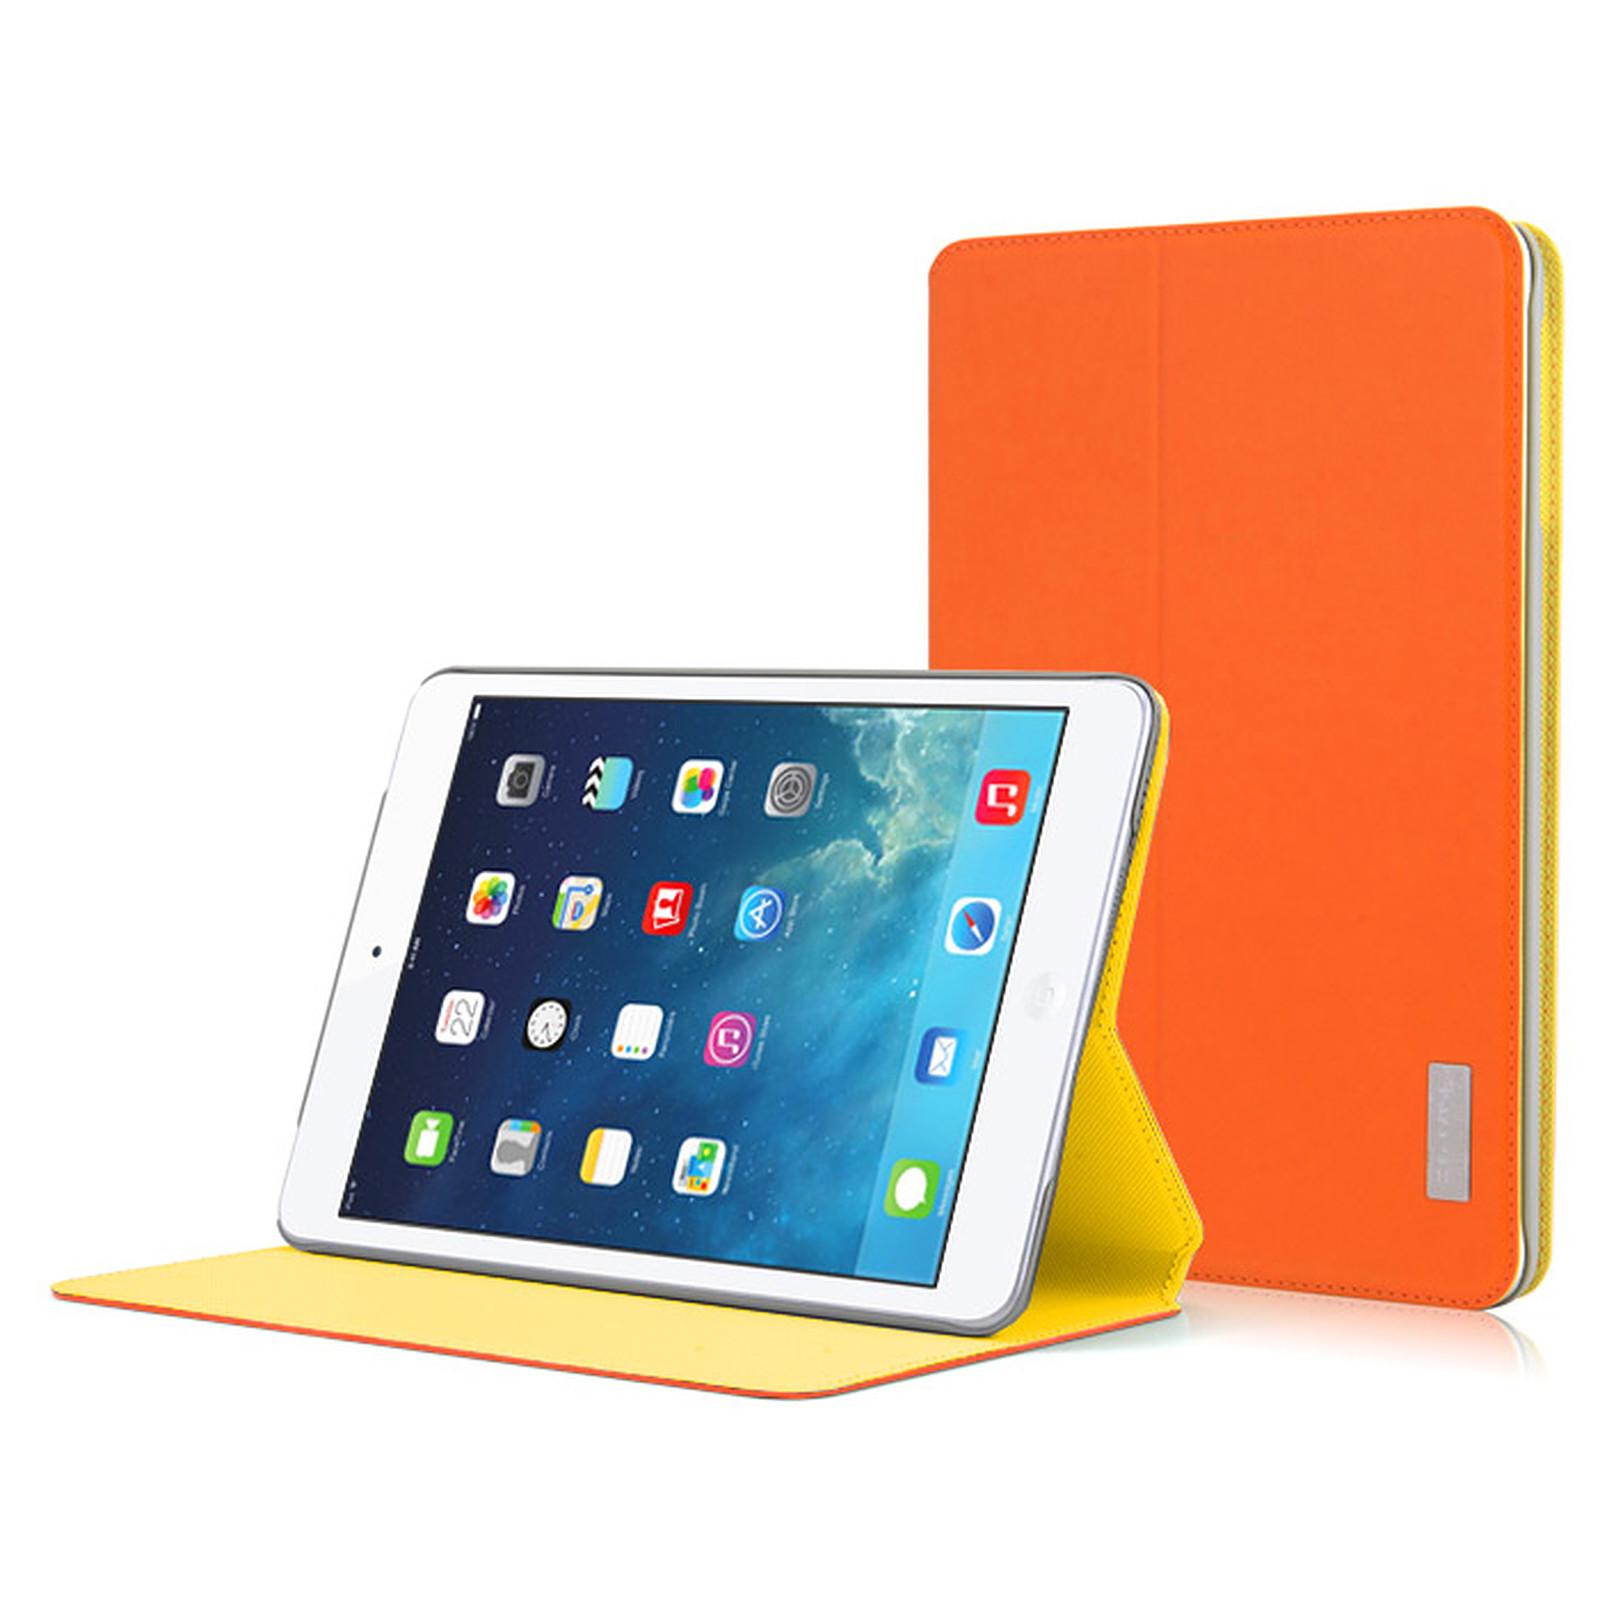 g case protective shell for ipad air orange etui. Black Bedroom Furniture Sets. Home Design Ideas